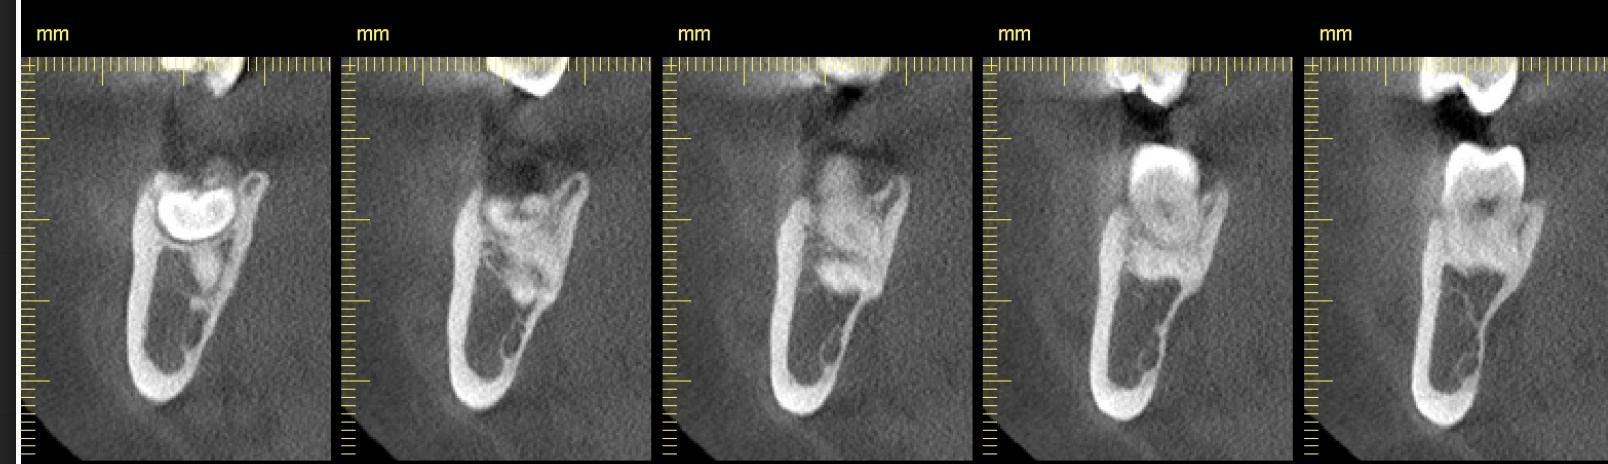 Individual wisdom teeth x-rays.